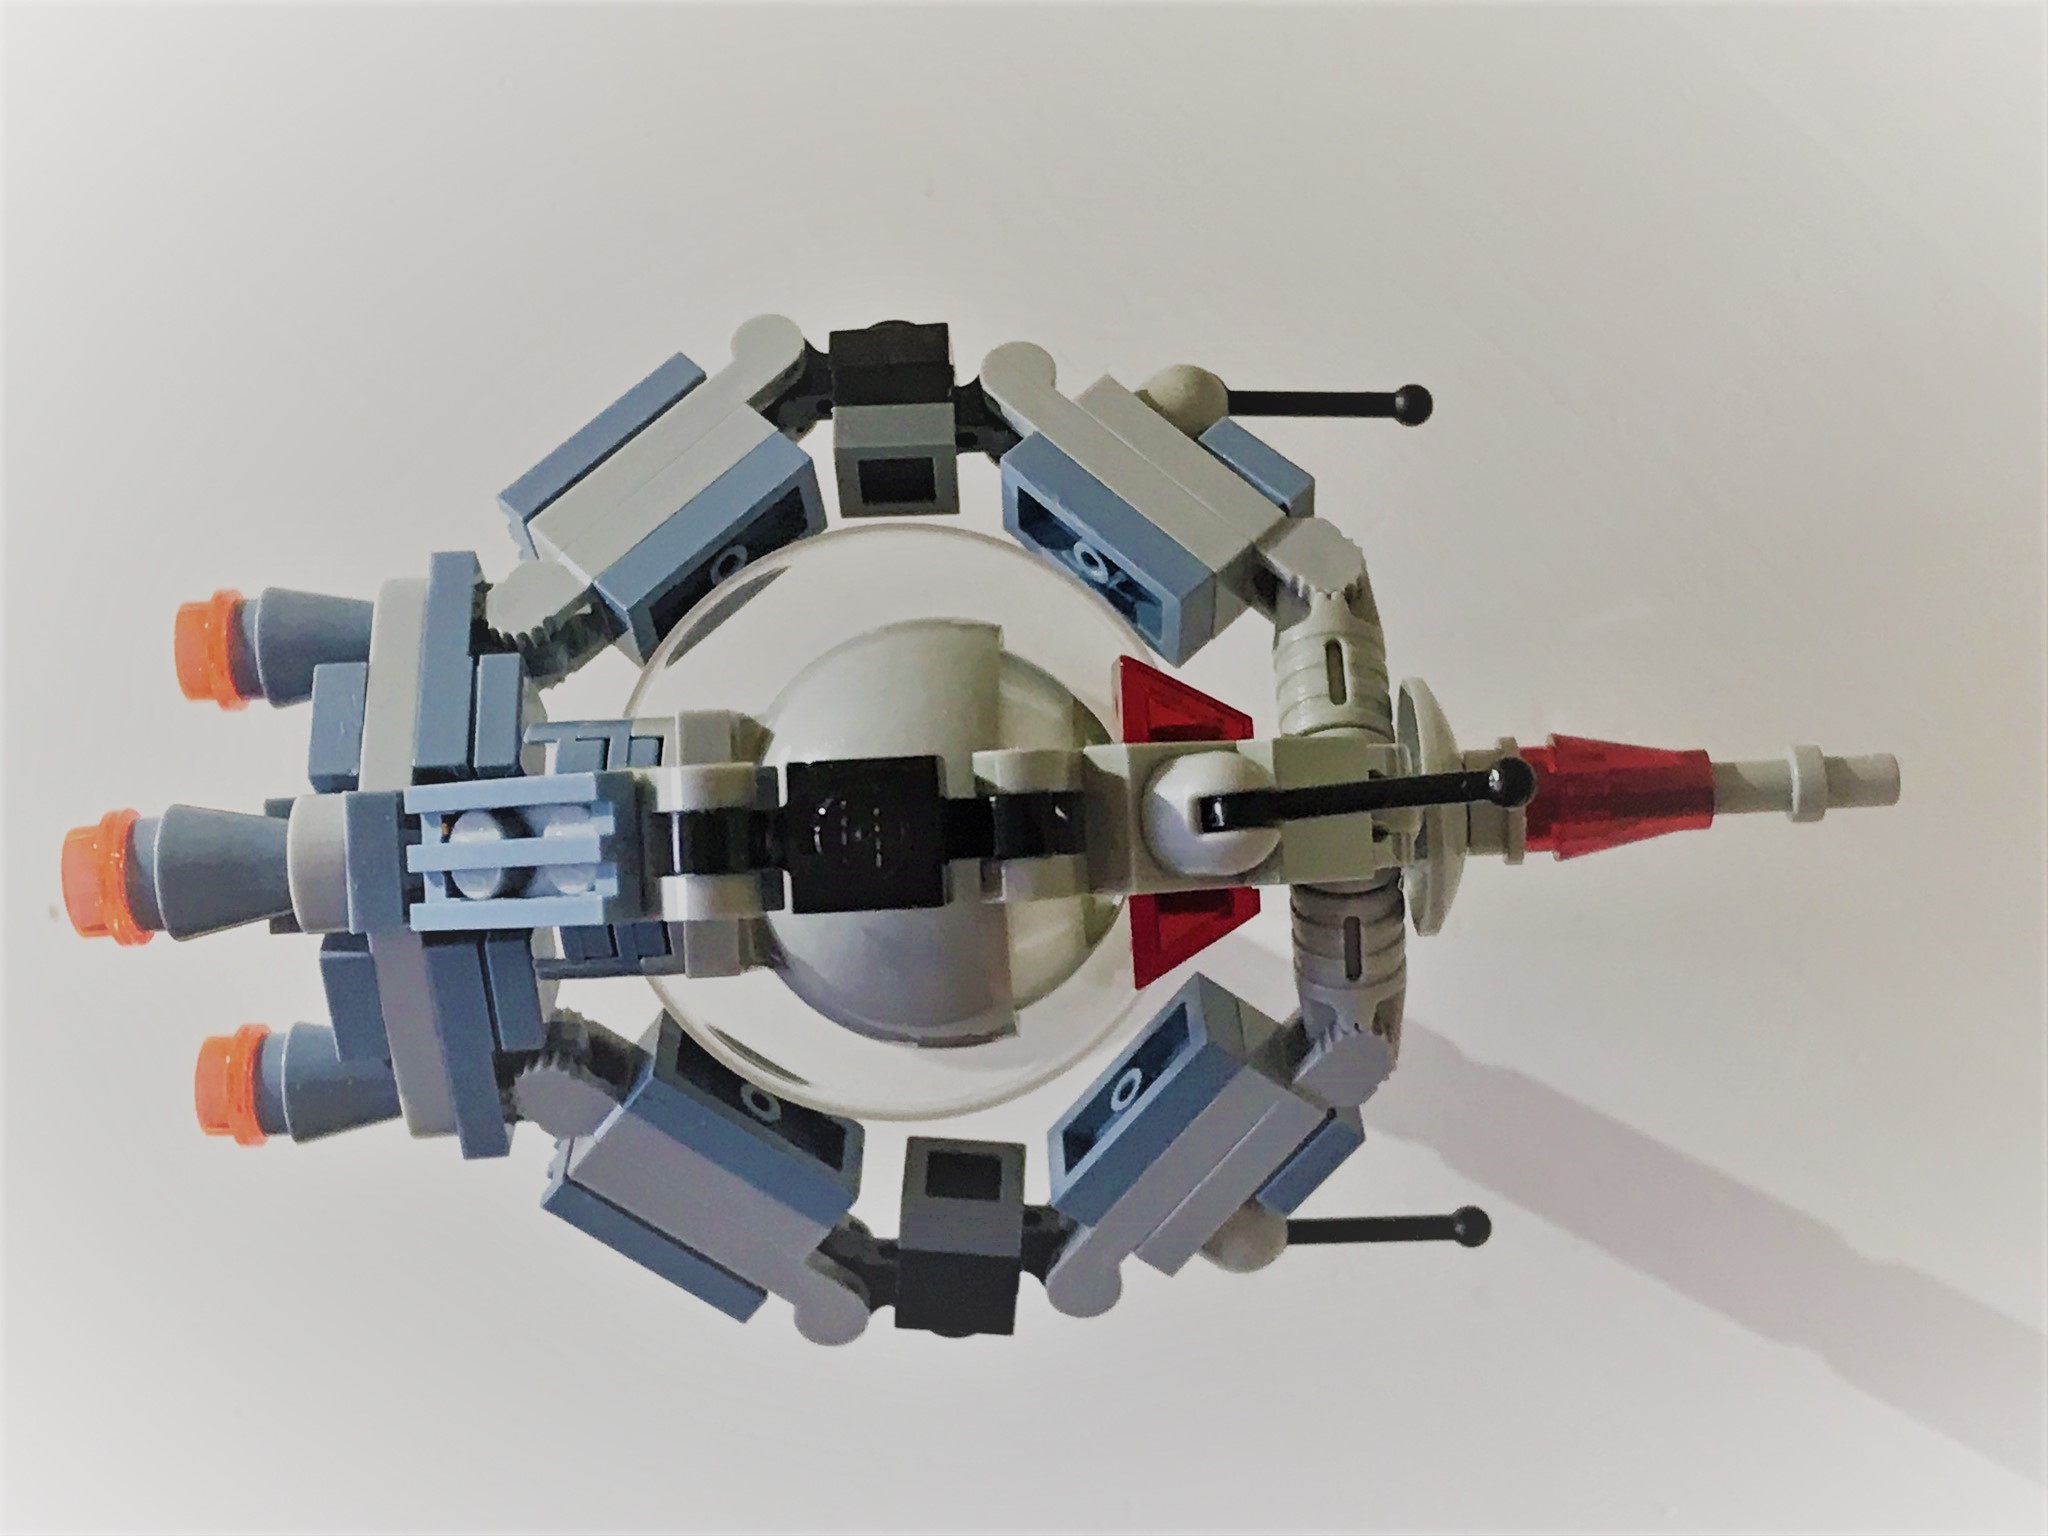 Droidtrifighter5.JPEG